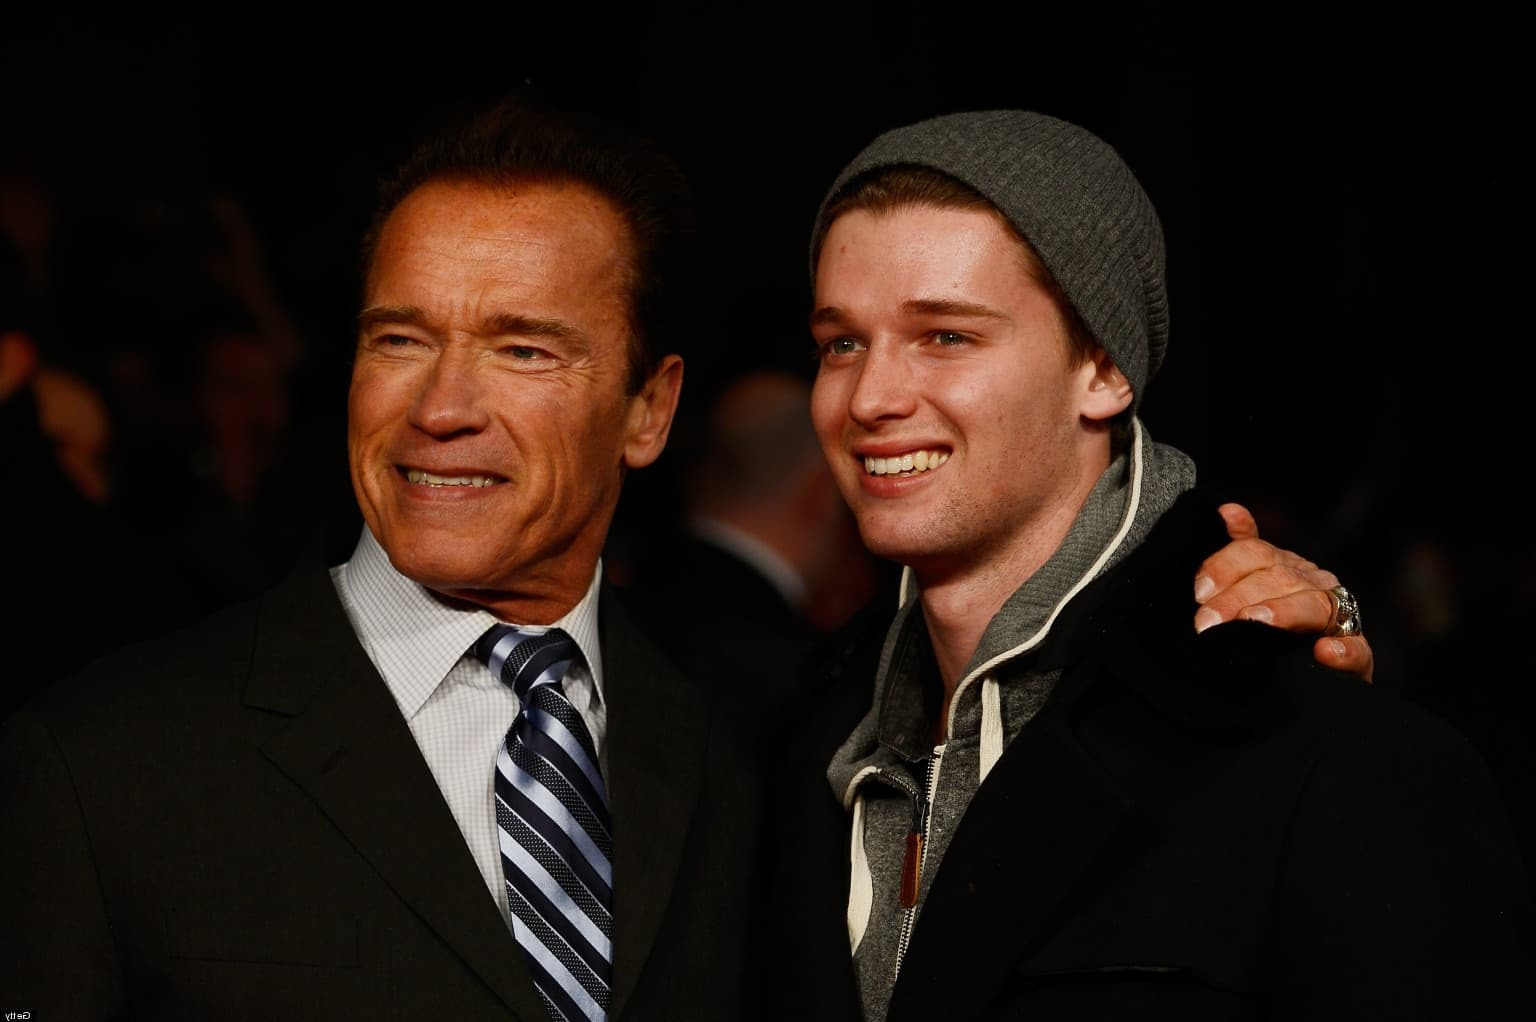 Patrick Schwarzenegger Wallpaper